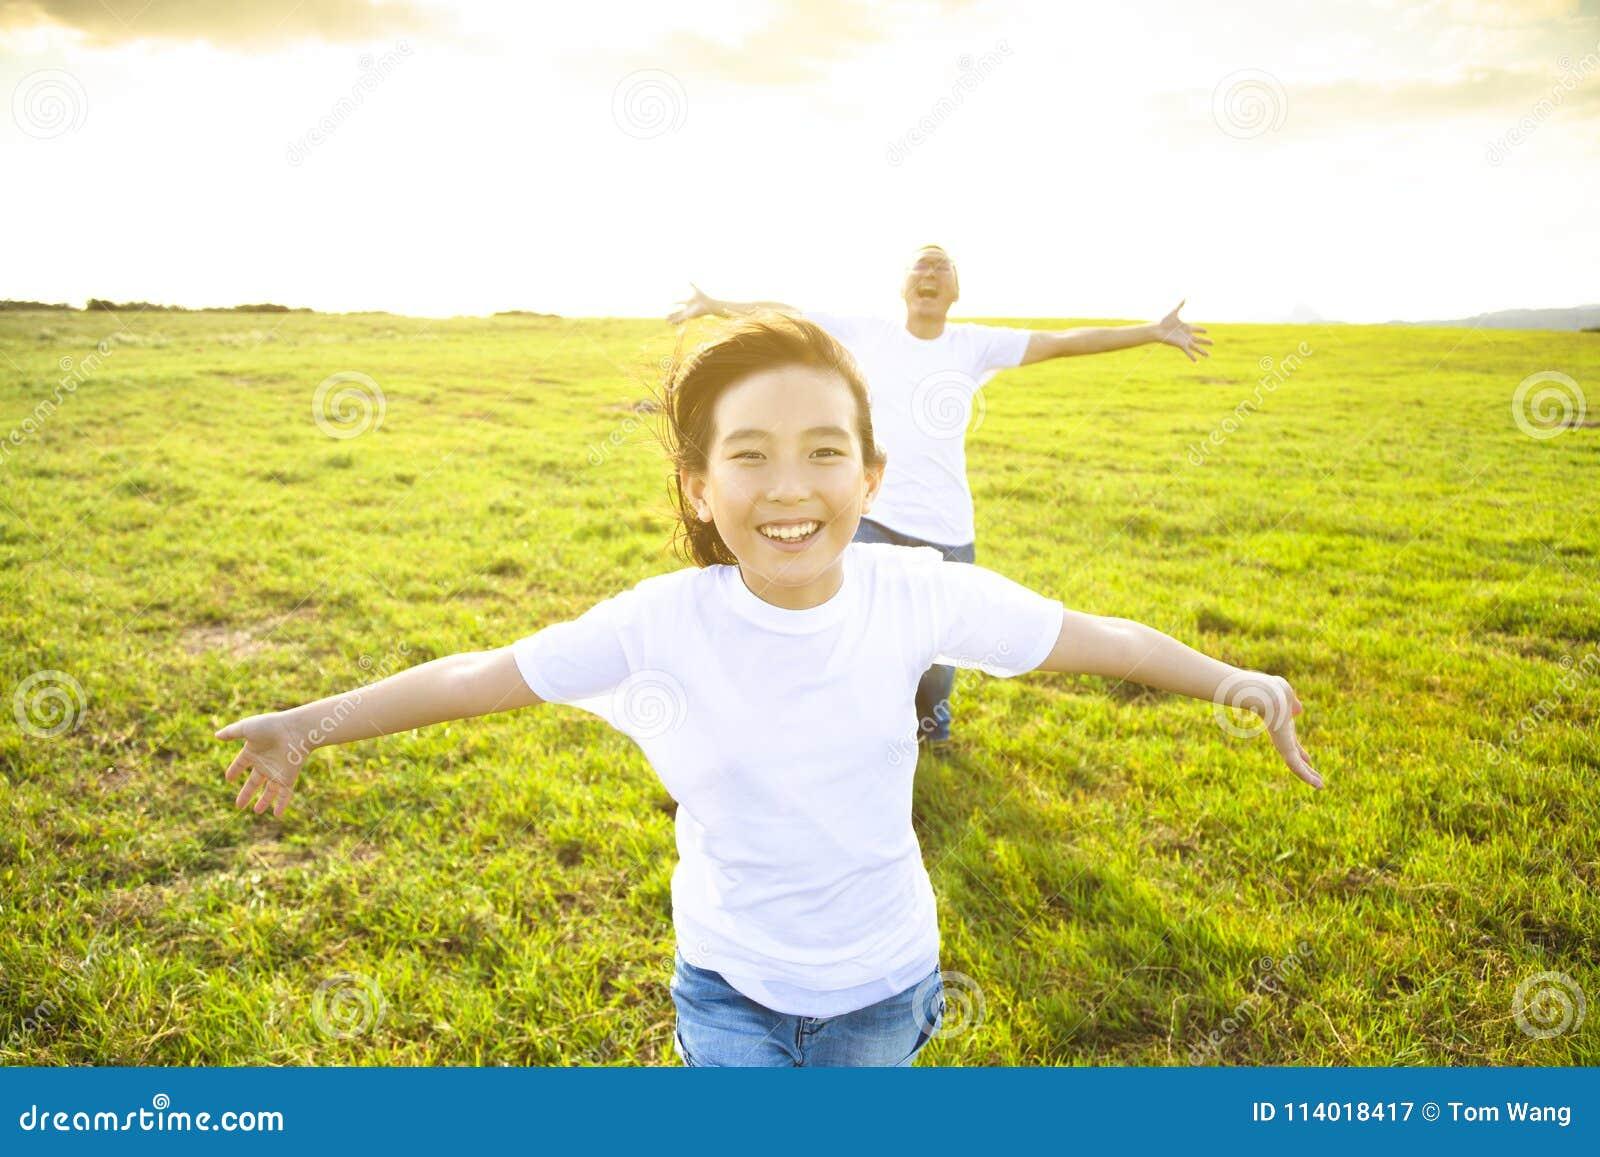 Ojca i dziecka bieg na łące